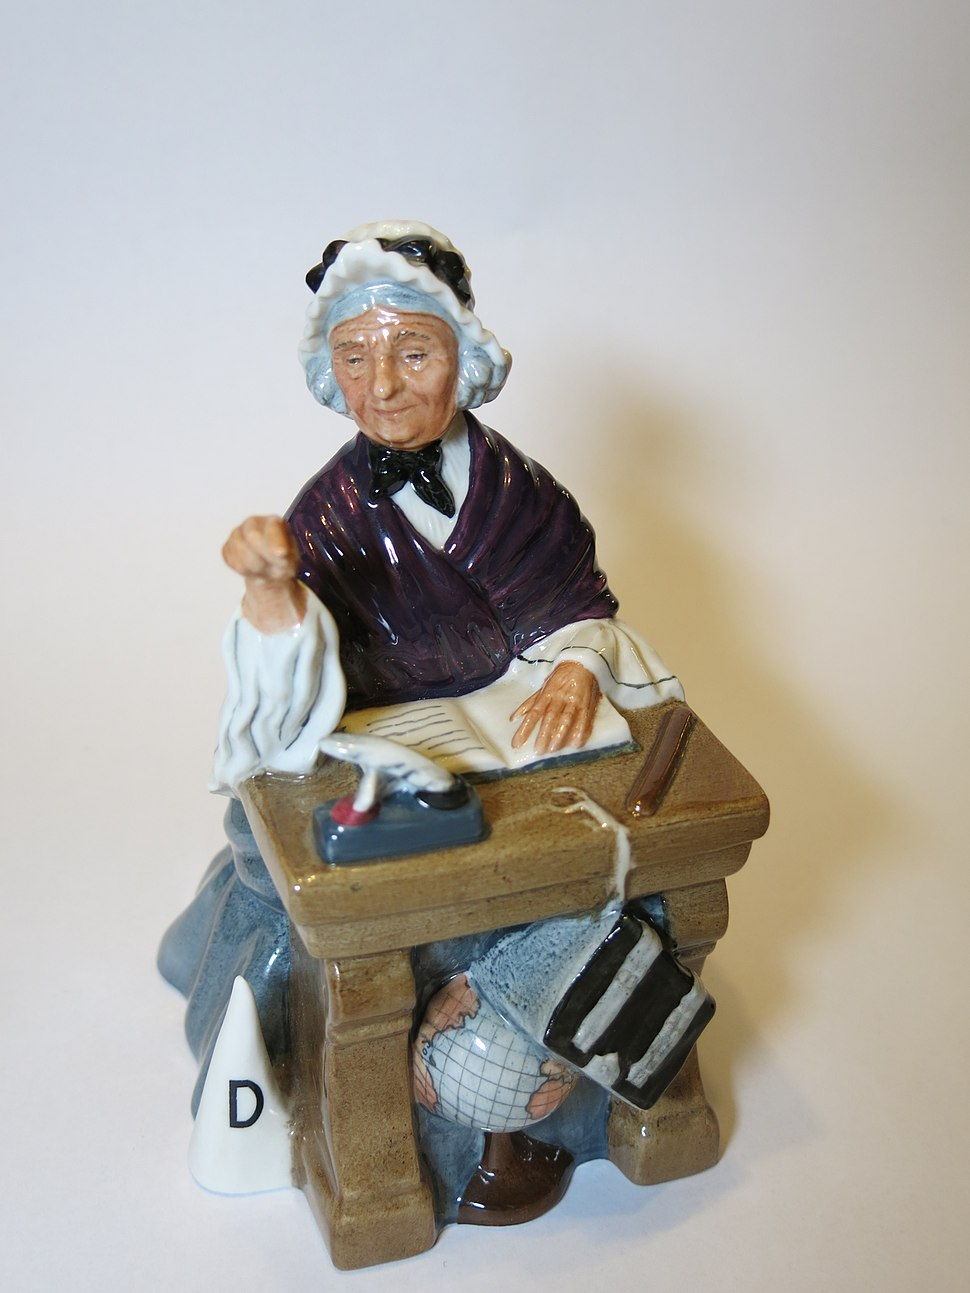 Schoolmarm, a figurine by Royal Doulton